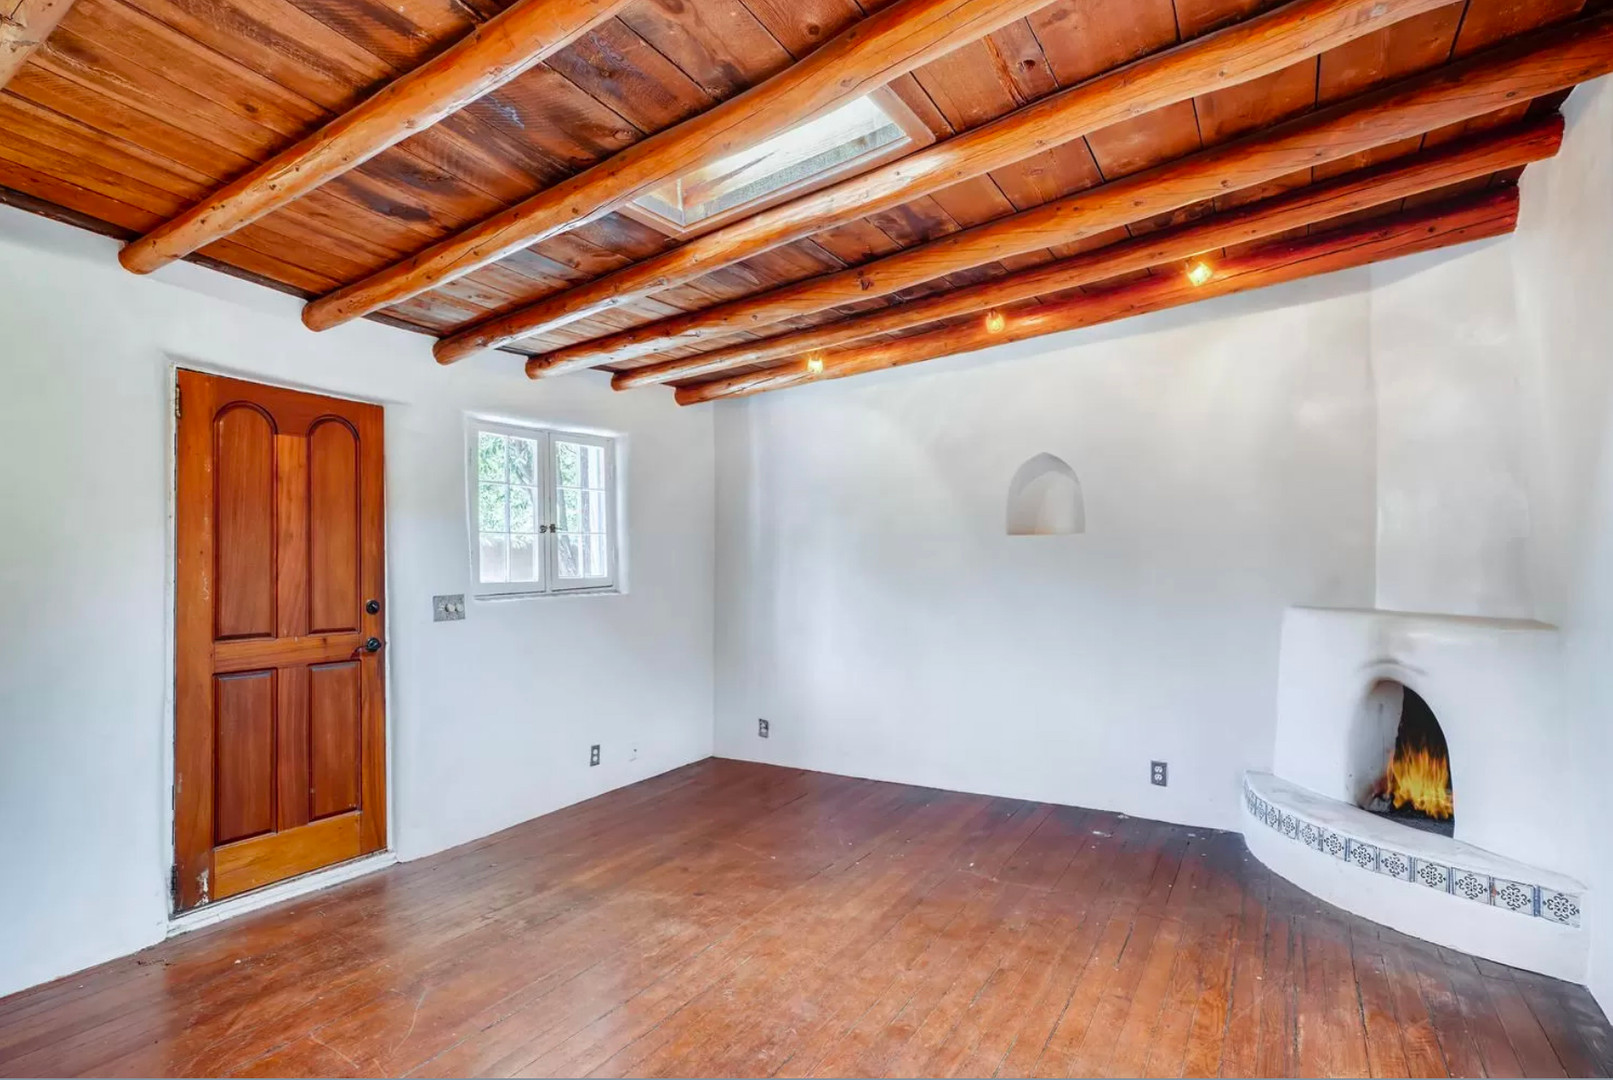 East Alameda | Vacant Living Room in Historic Santa Fe Home